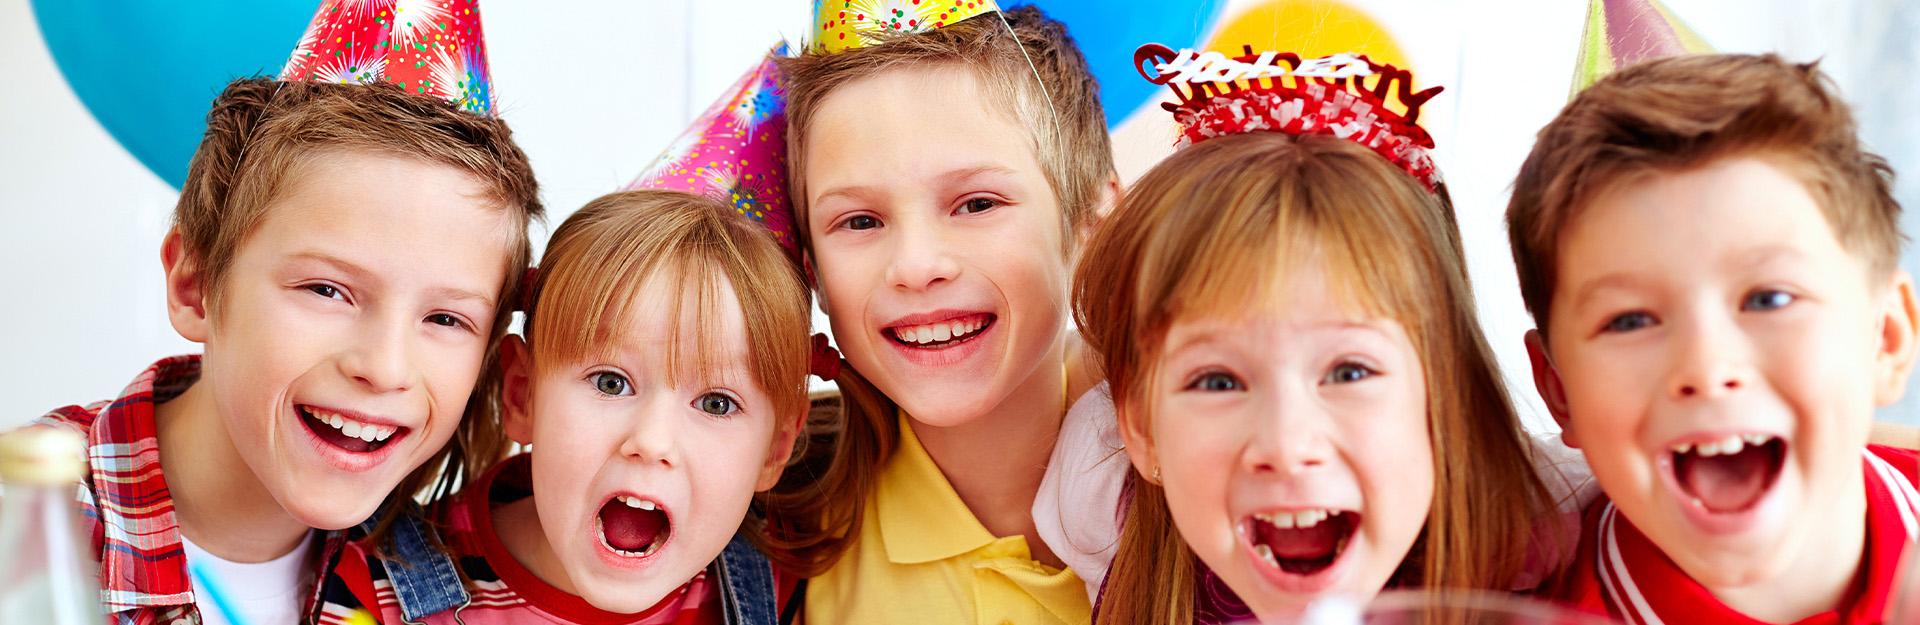 Groups Birthday image